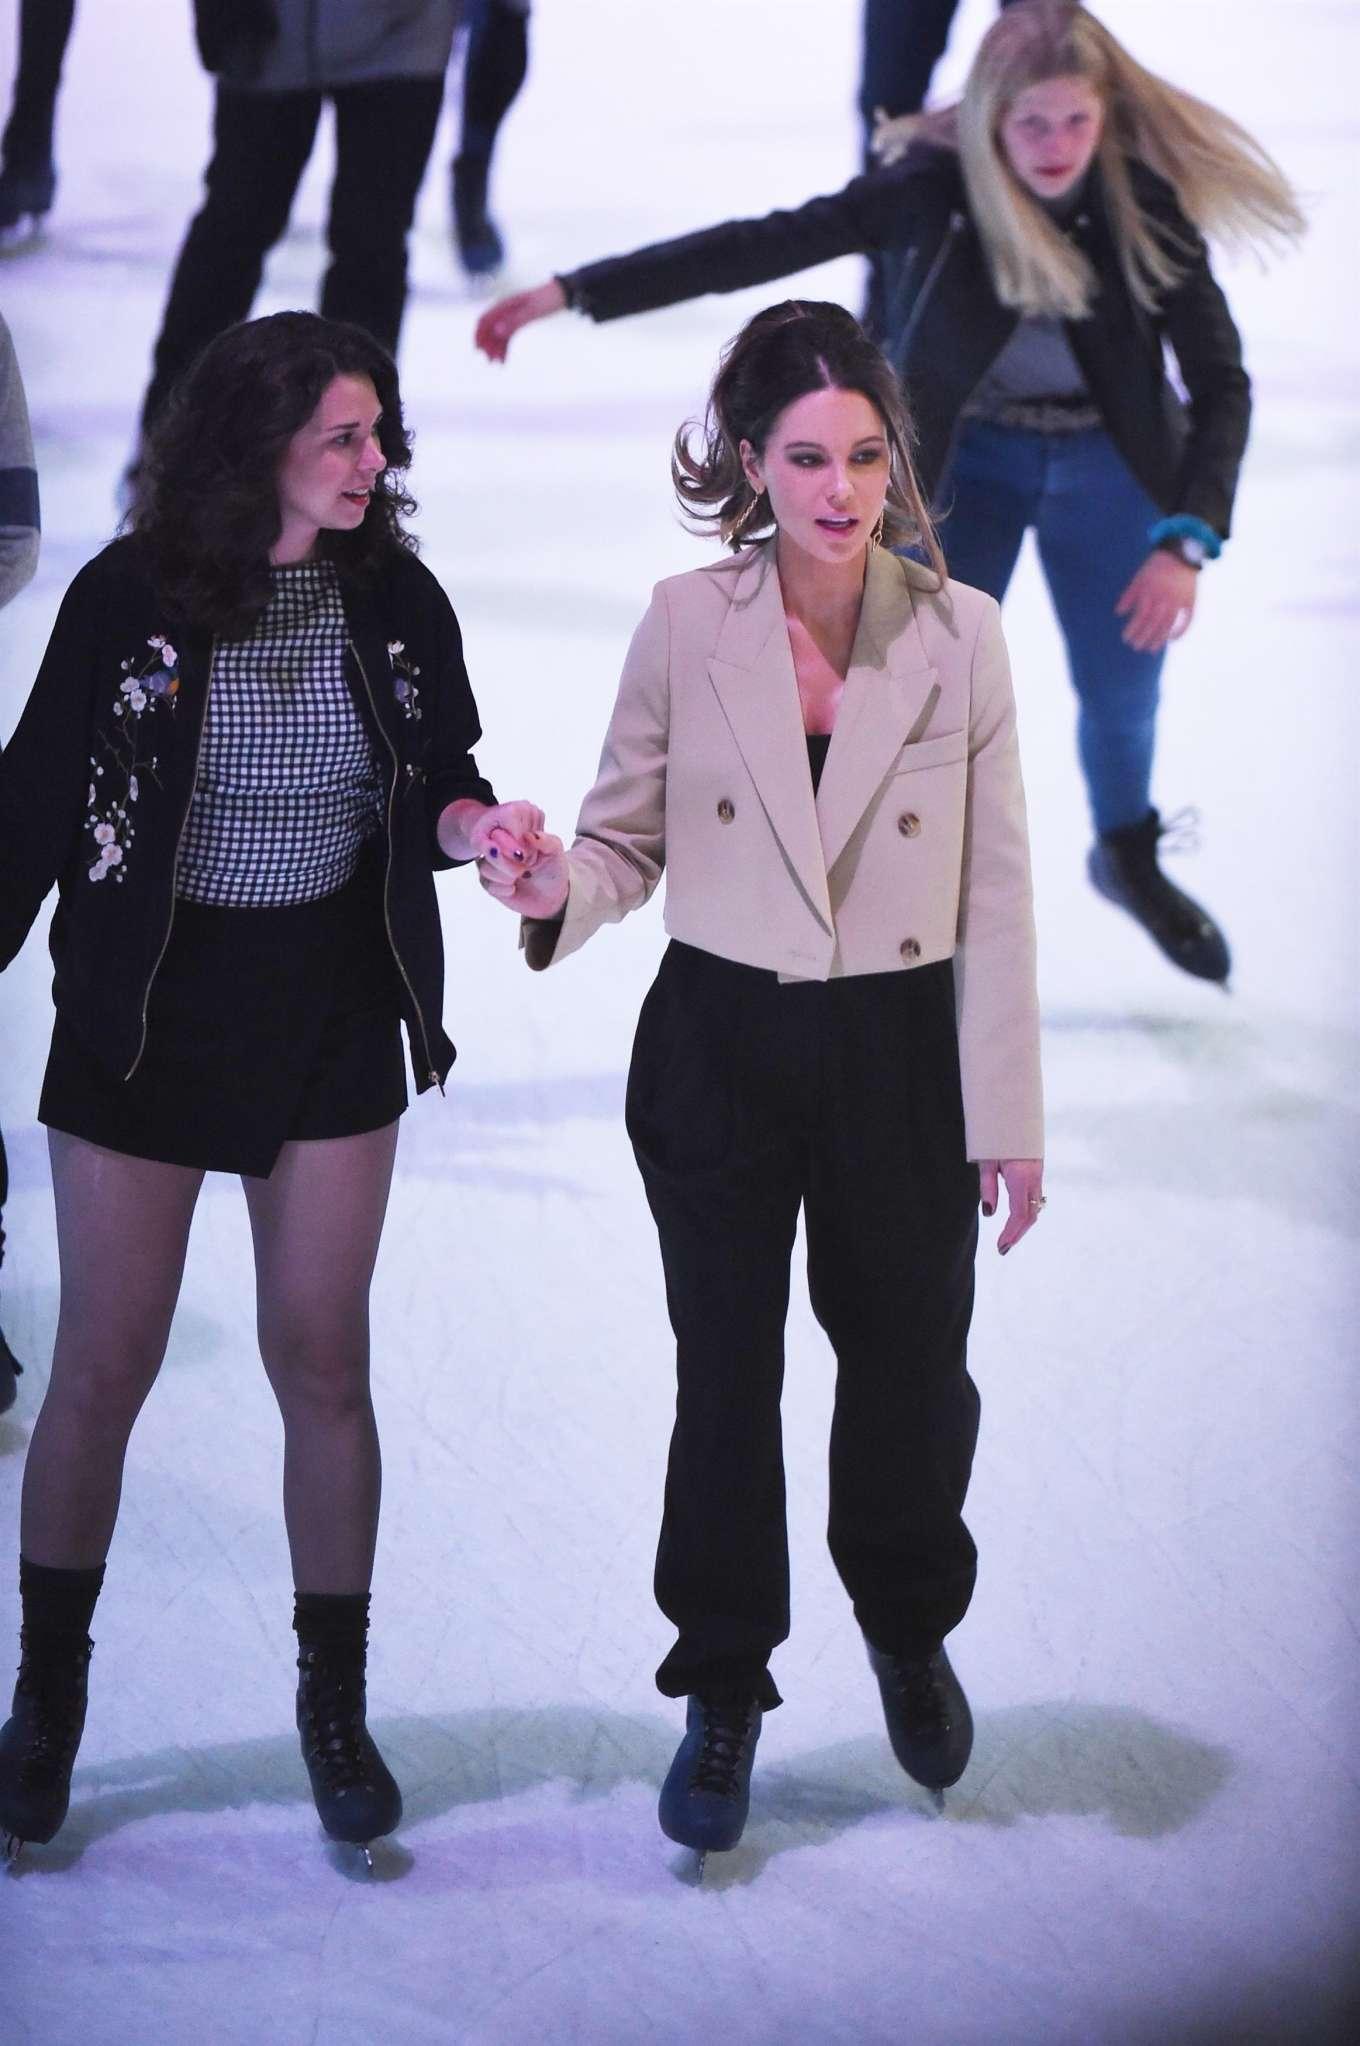 Kate Beckinsale - Ice skating in New York